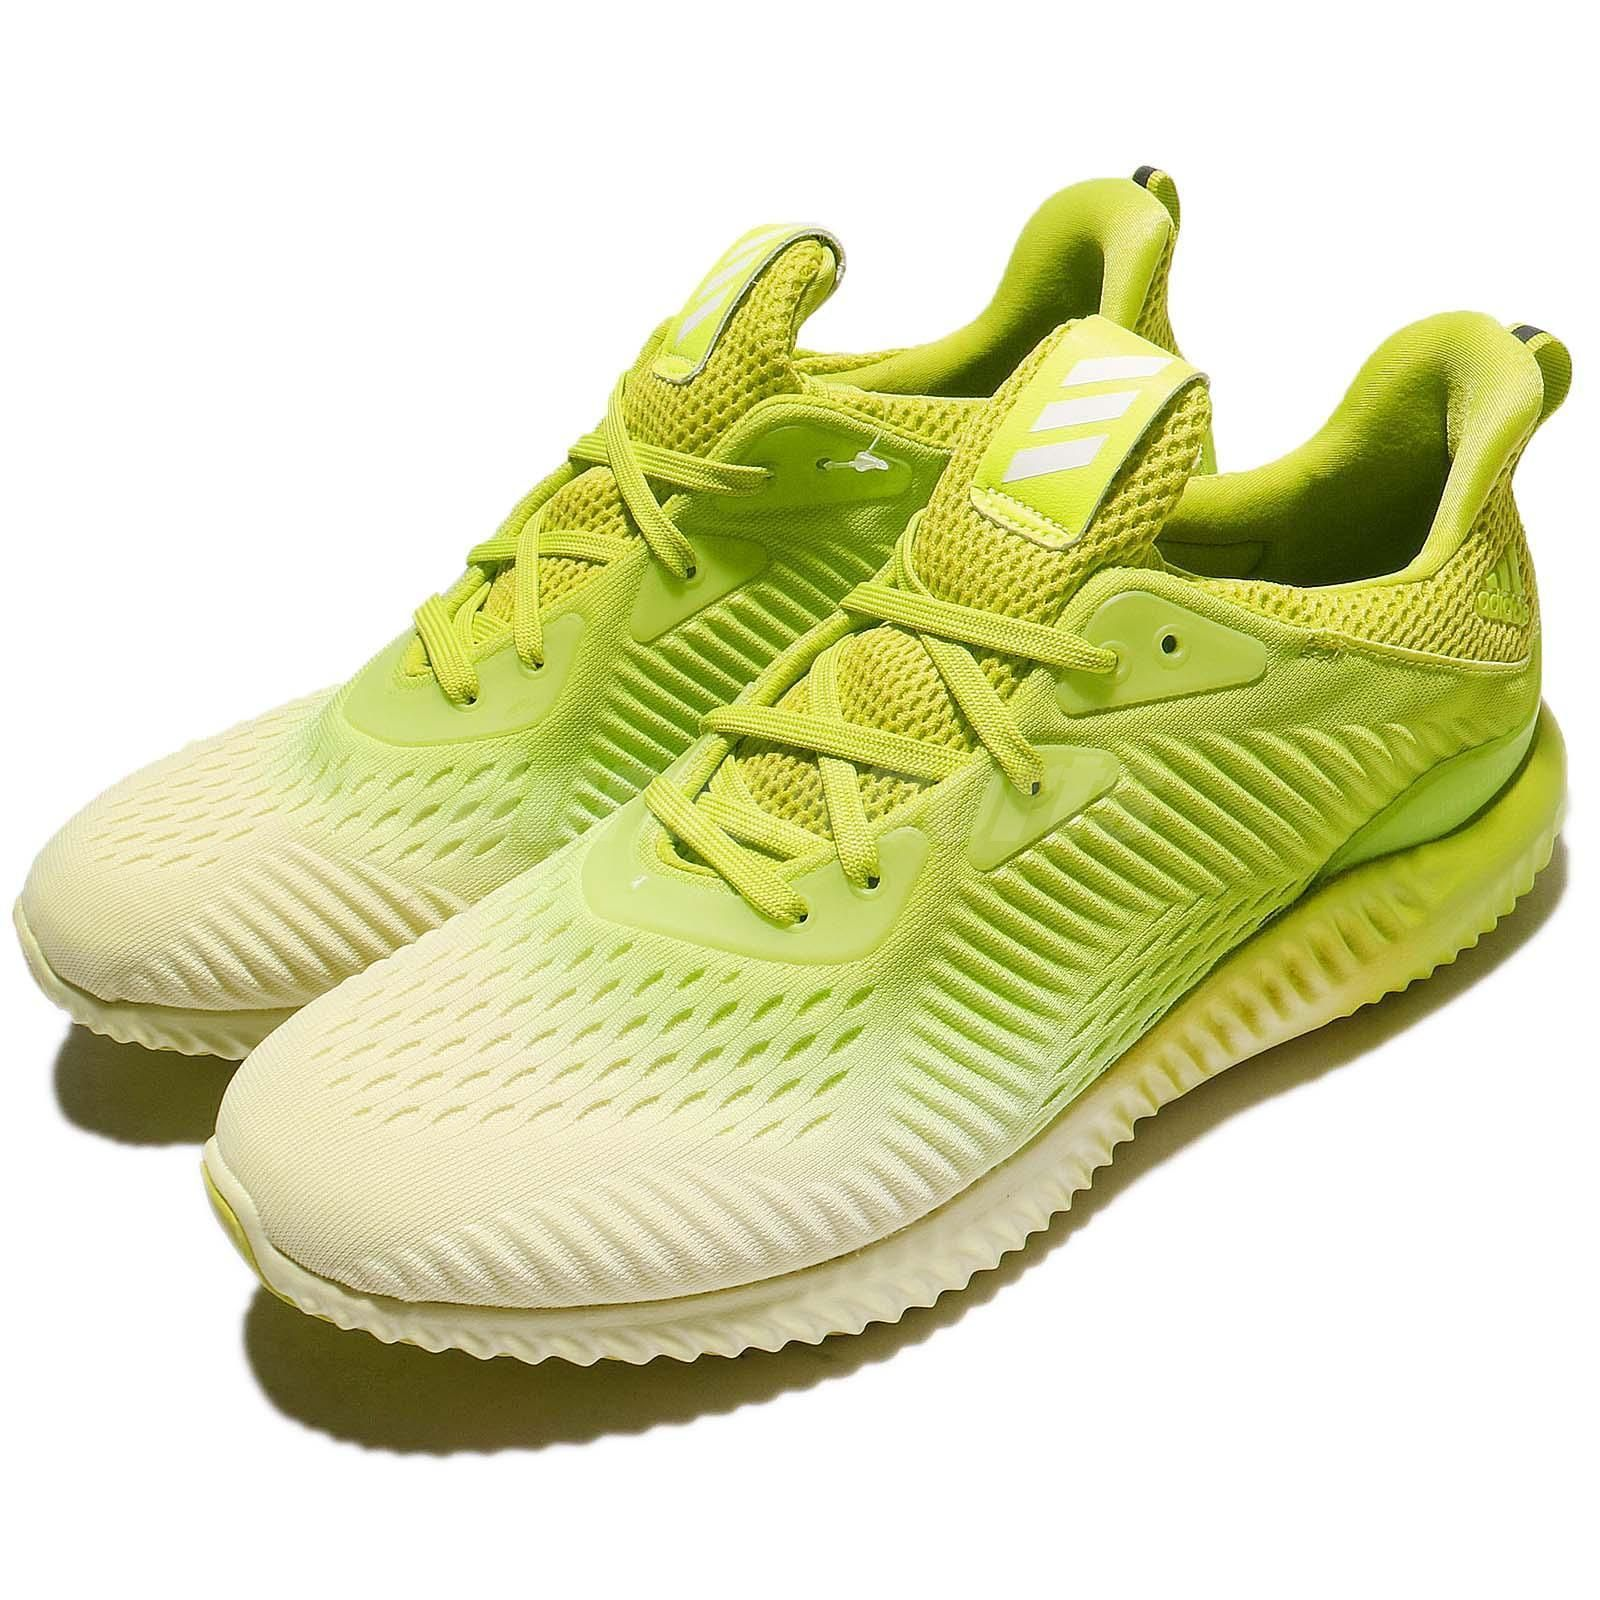 adidas Alphabounce EM M Ice Yellow Volt Men Running Shoes